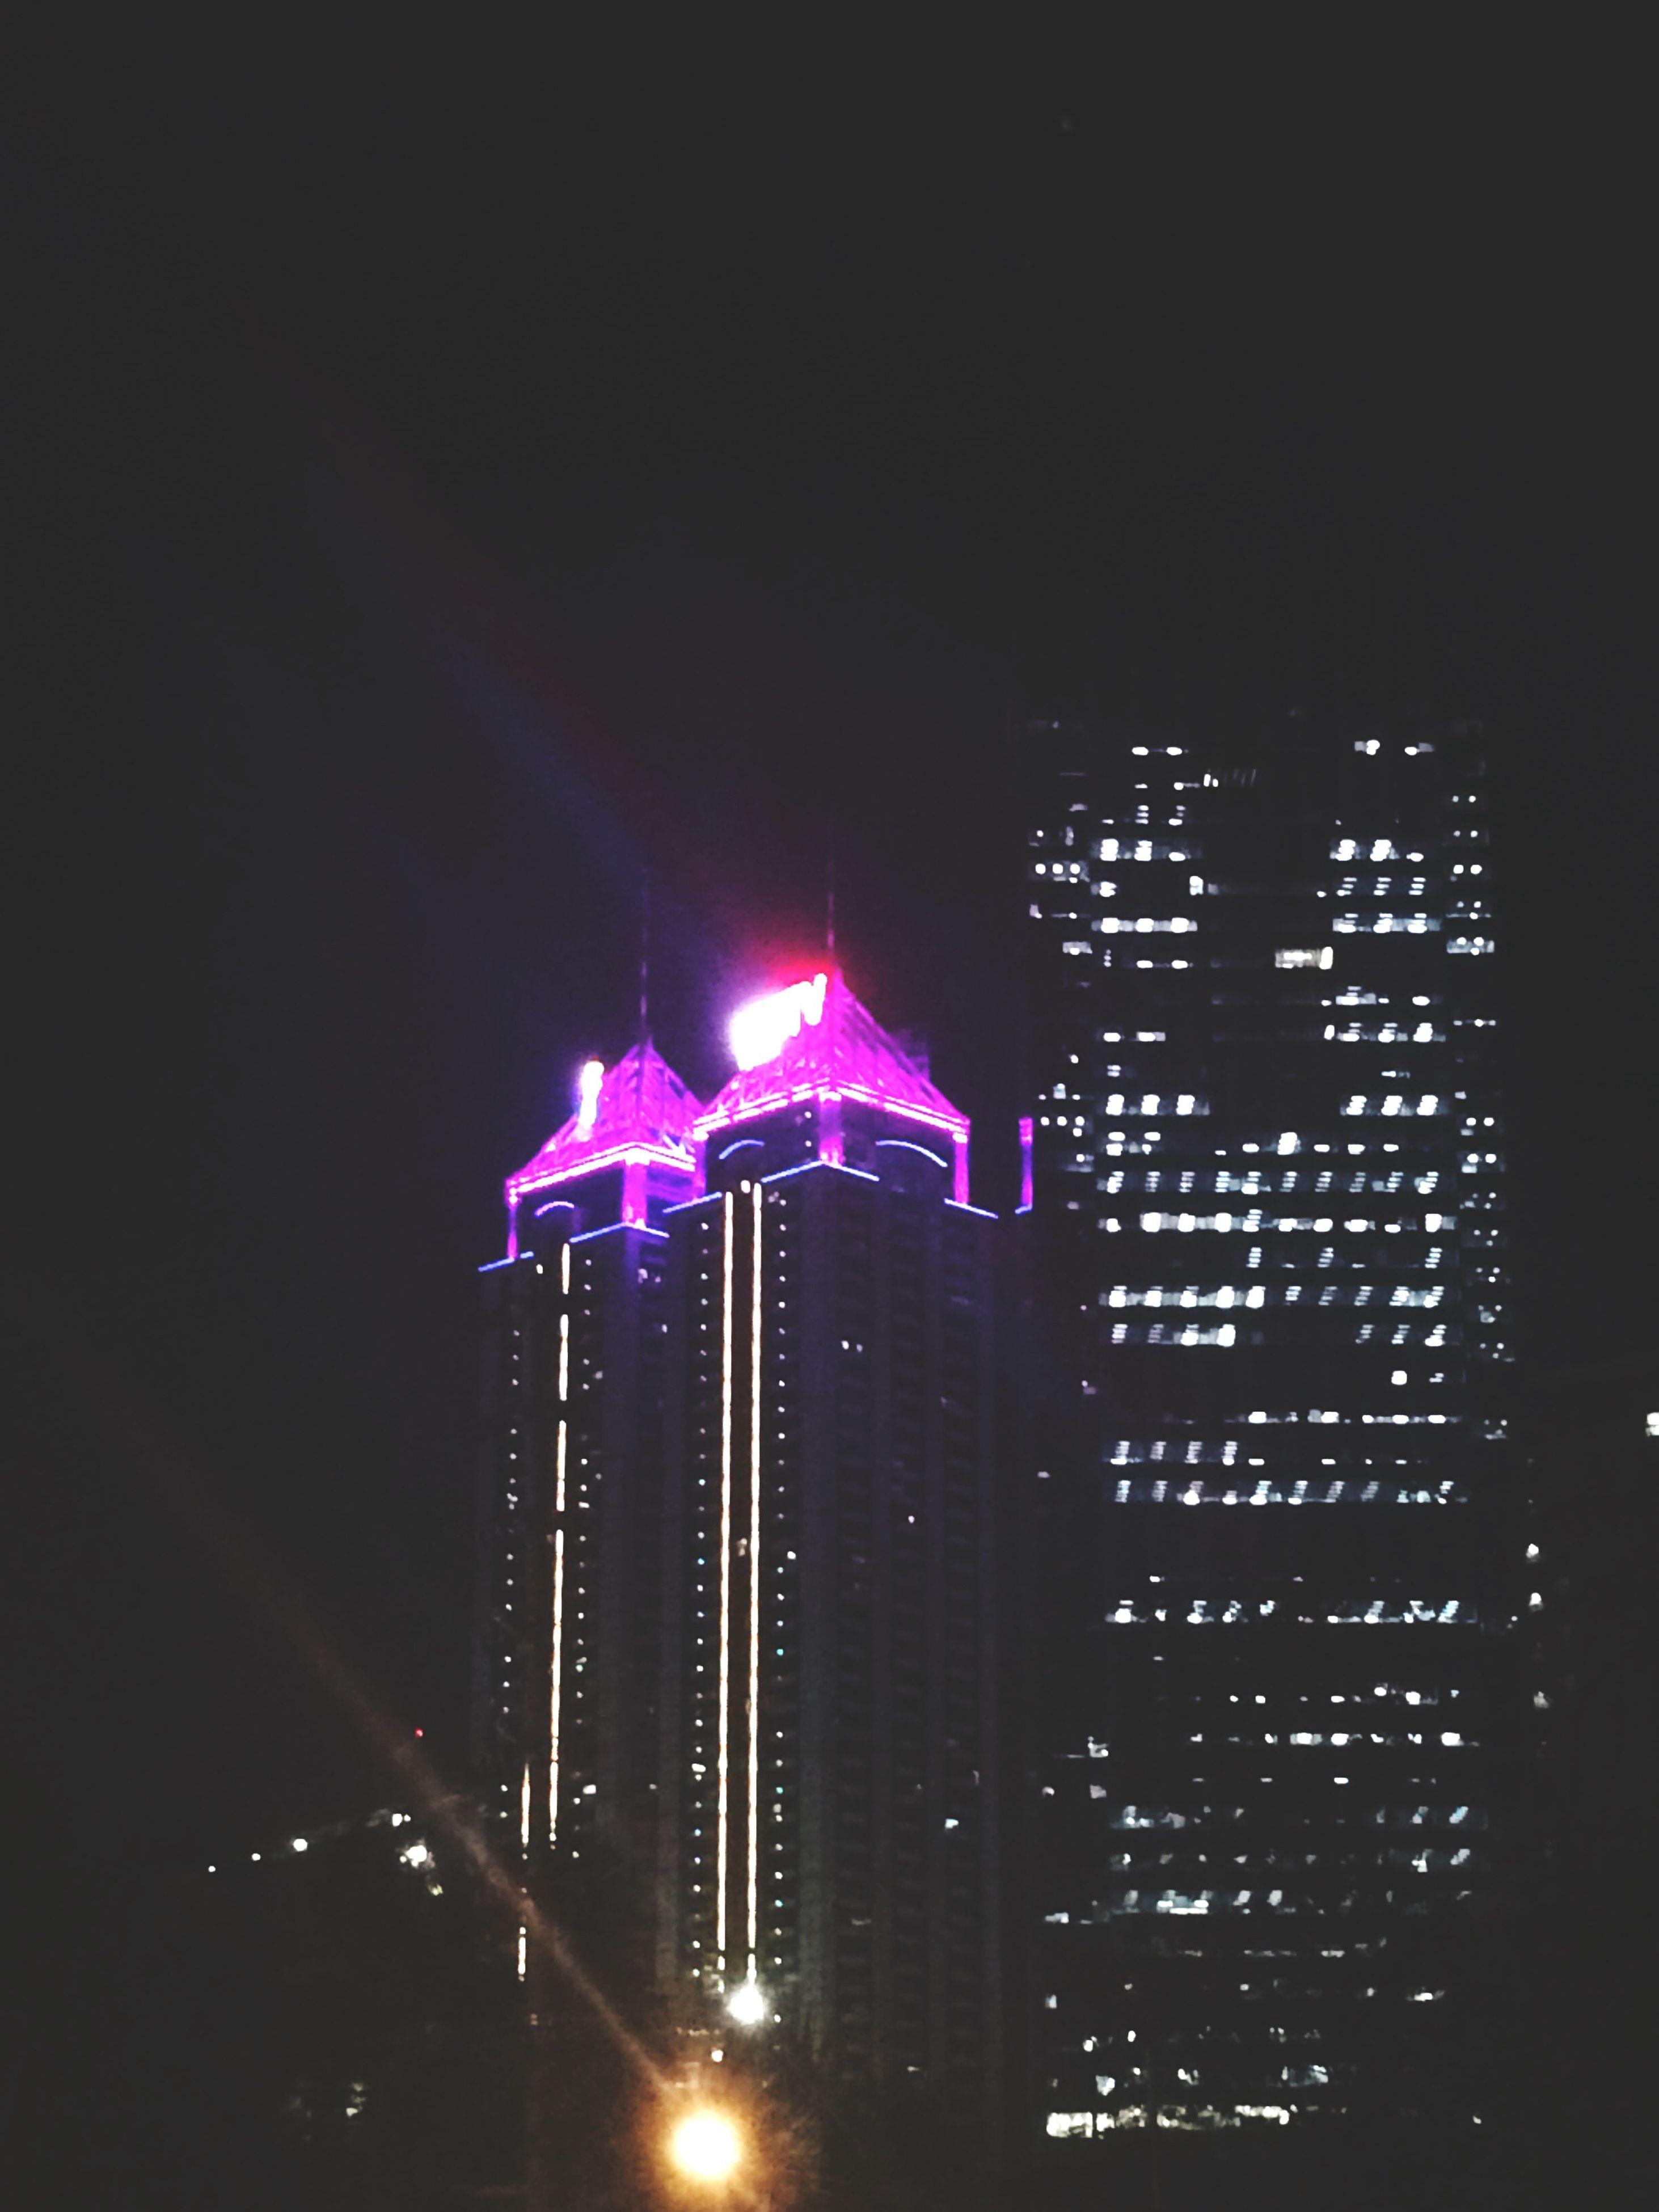 night, no people, illuminated, outdoors